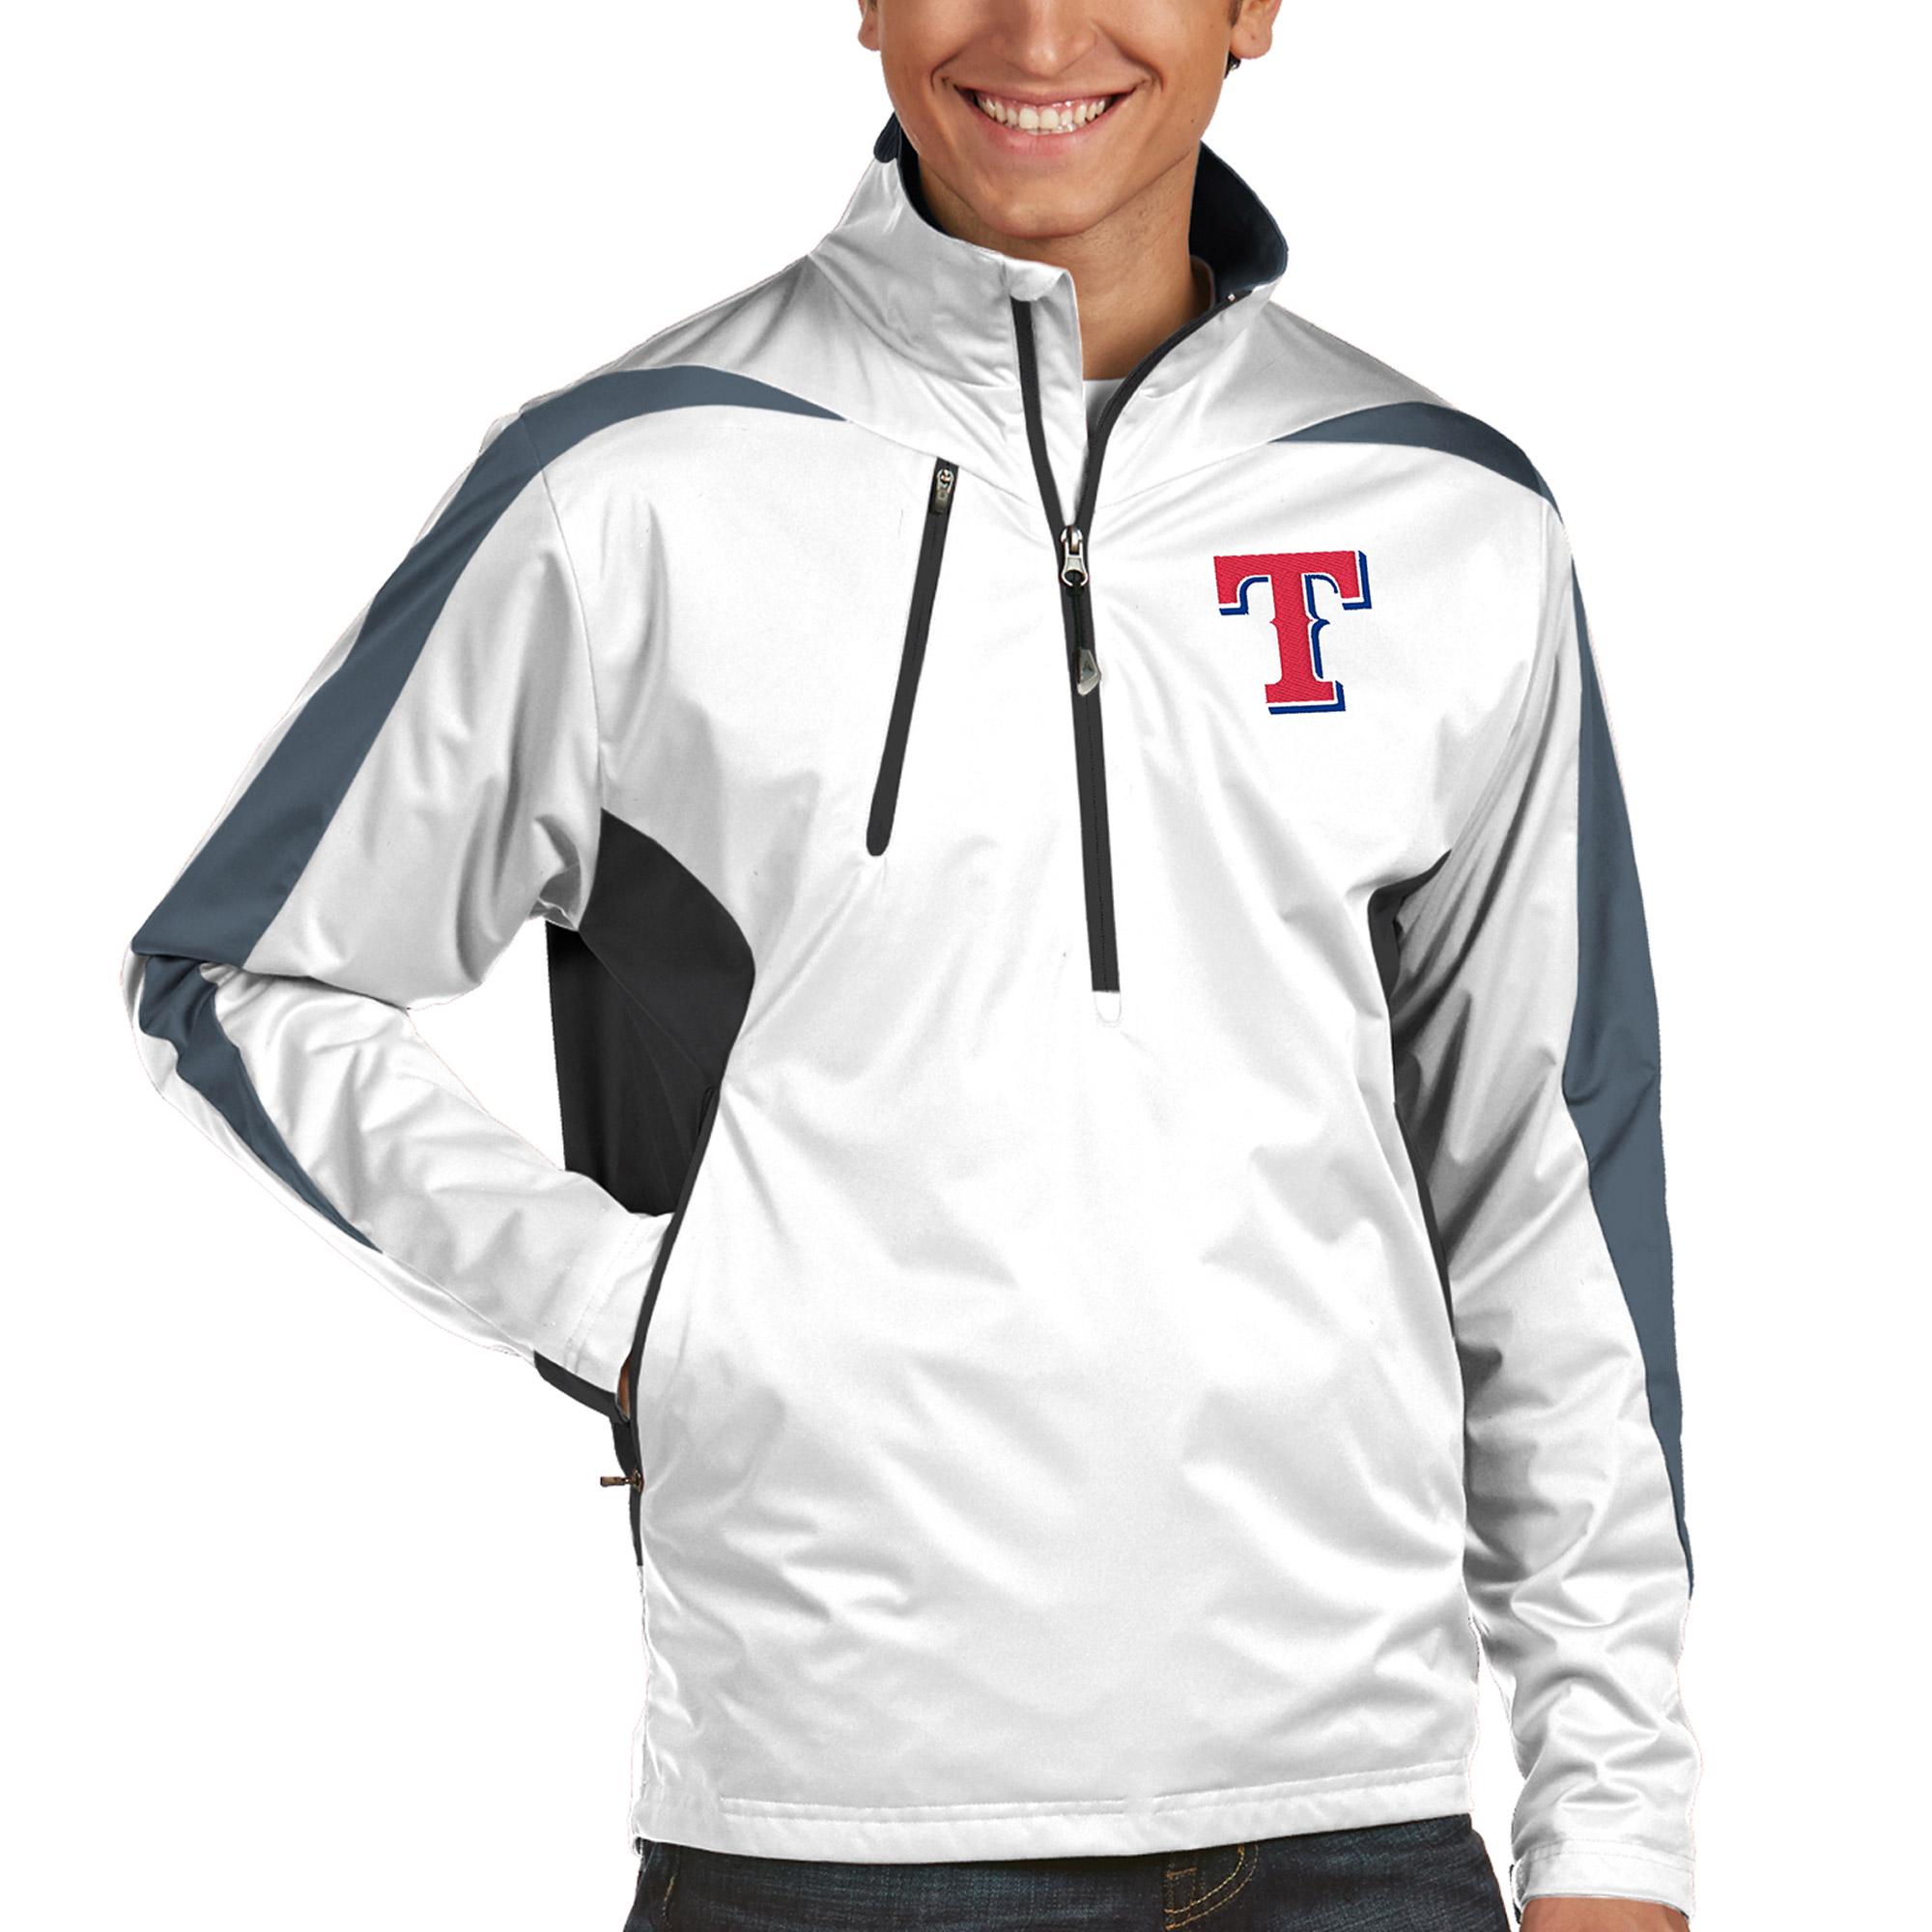 Texas Rangers Discover Half-Zip Jacket - White